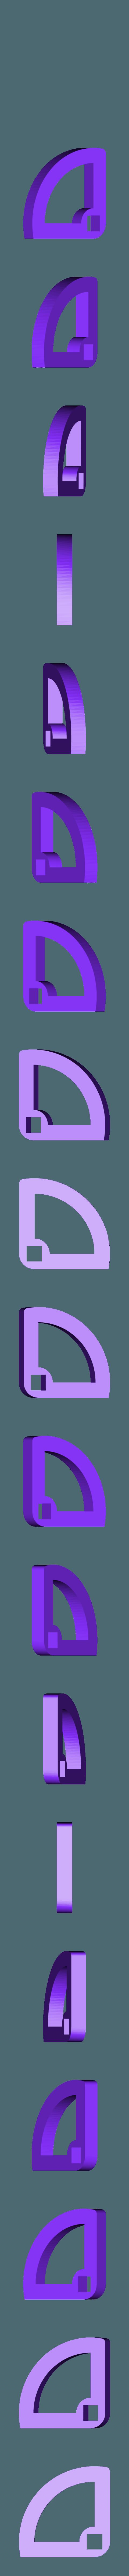 Cam_Pinky.stl Download free STL file Impatience, Motorized • 3D printer object, gzumwalt